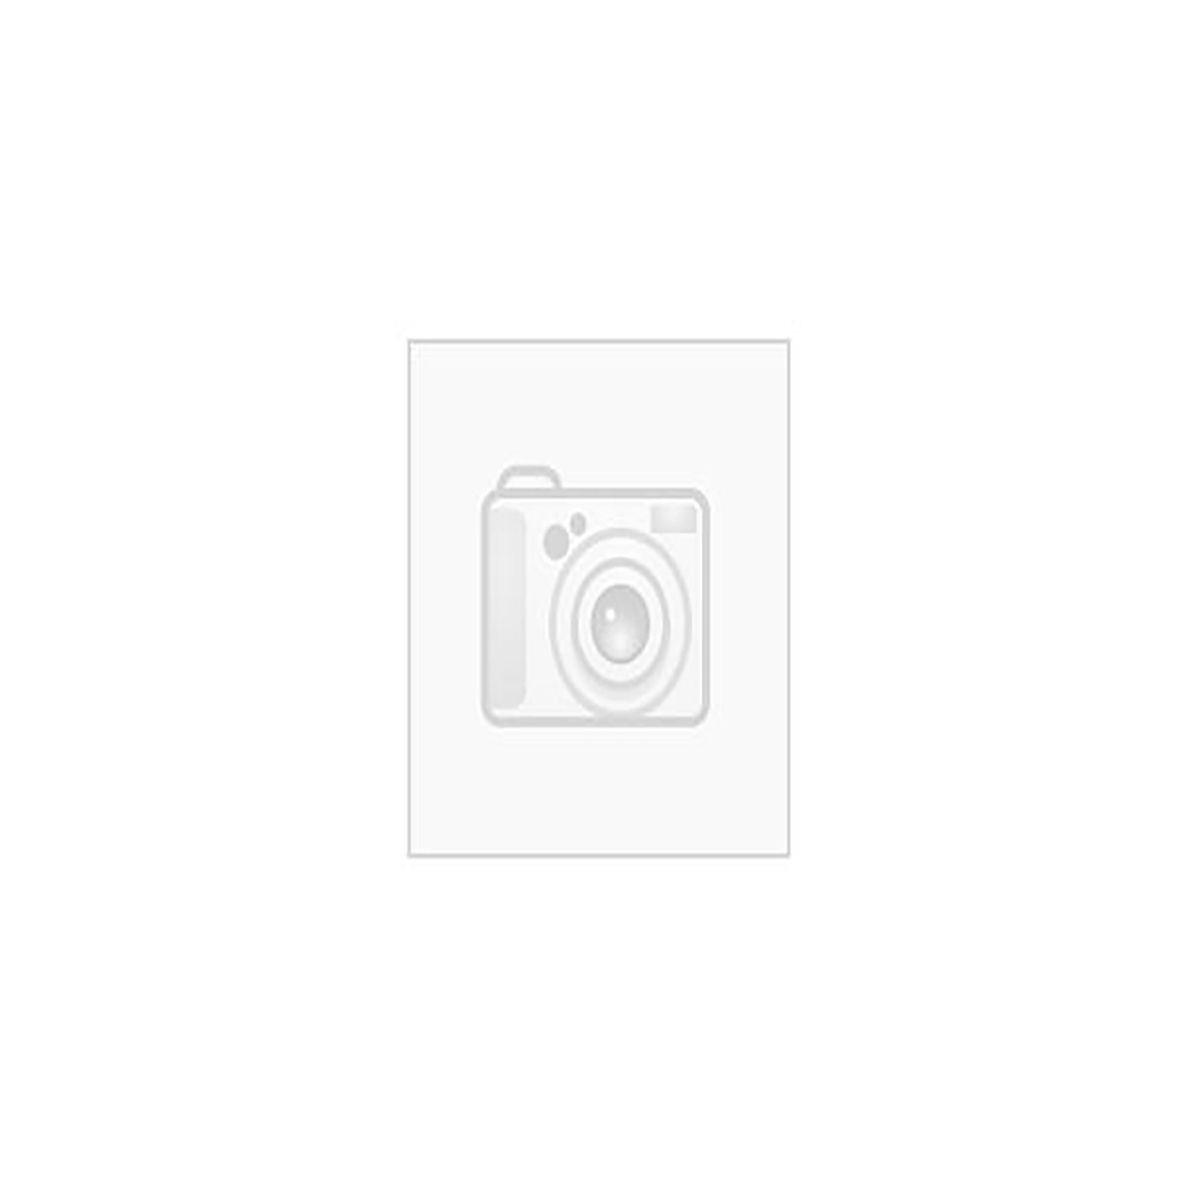 Tapwell - XCOL 7269 – Dusj